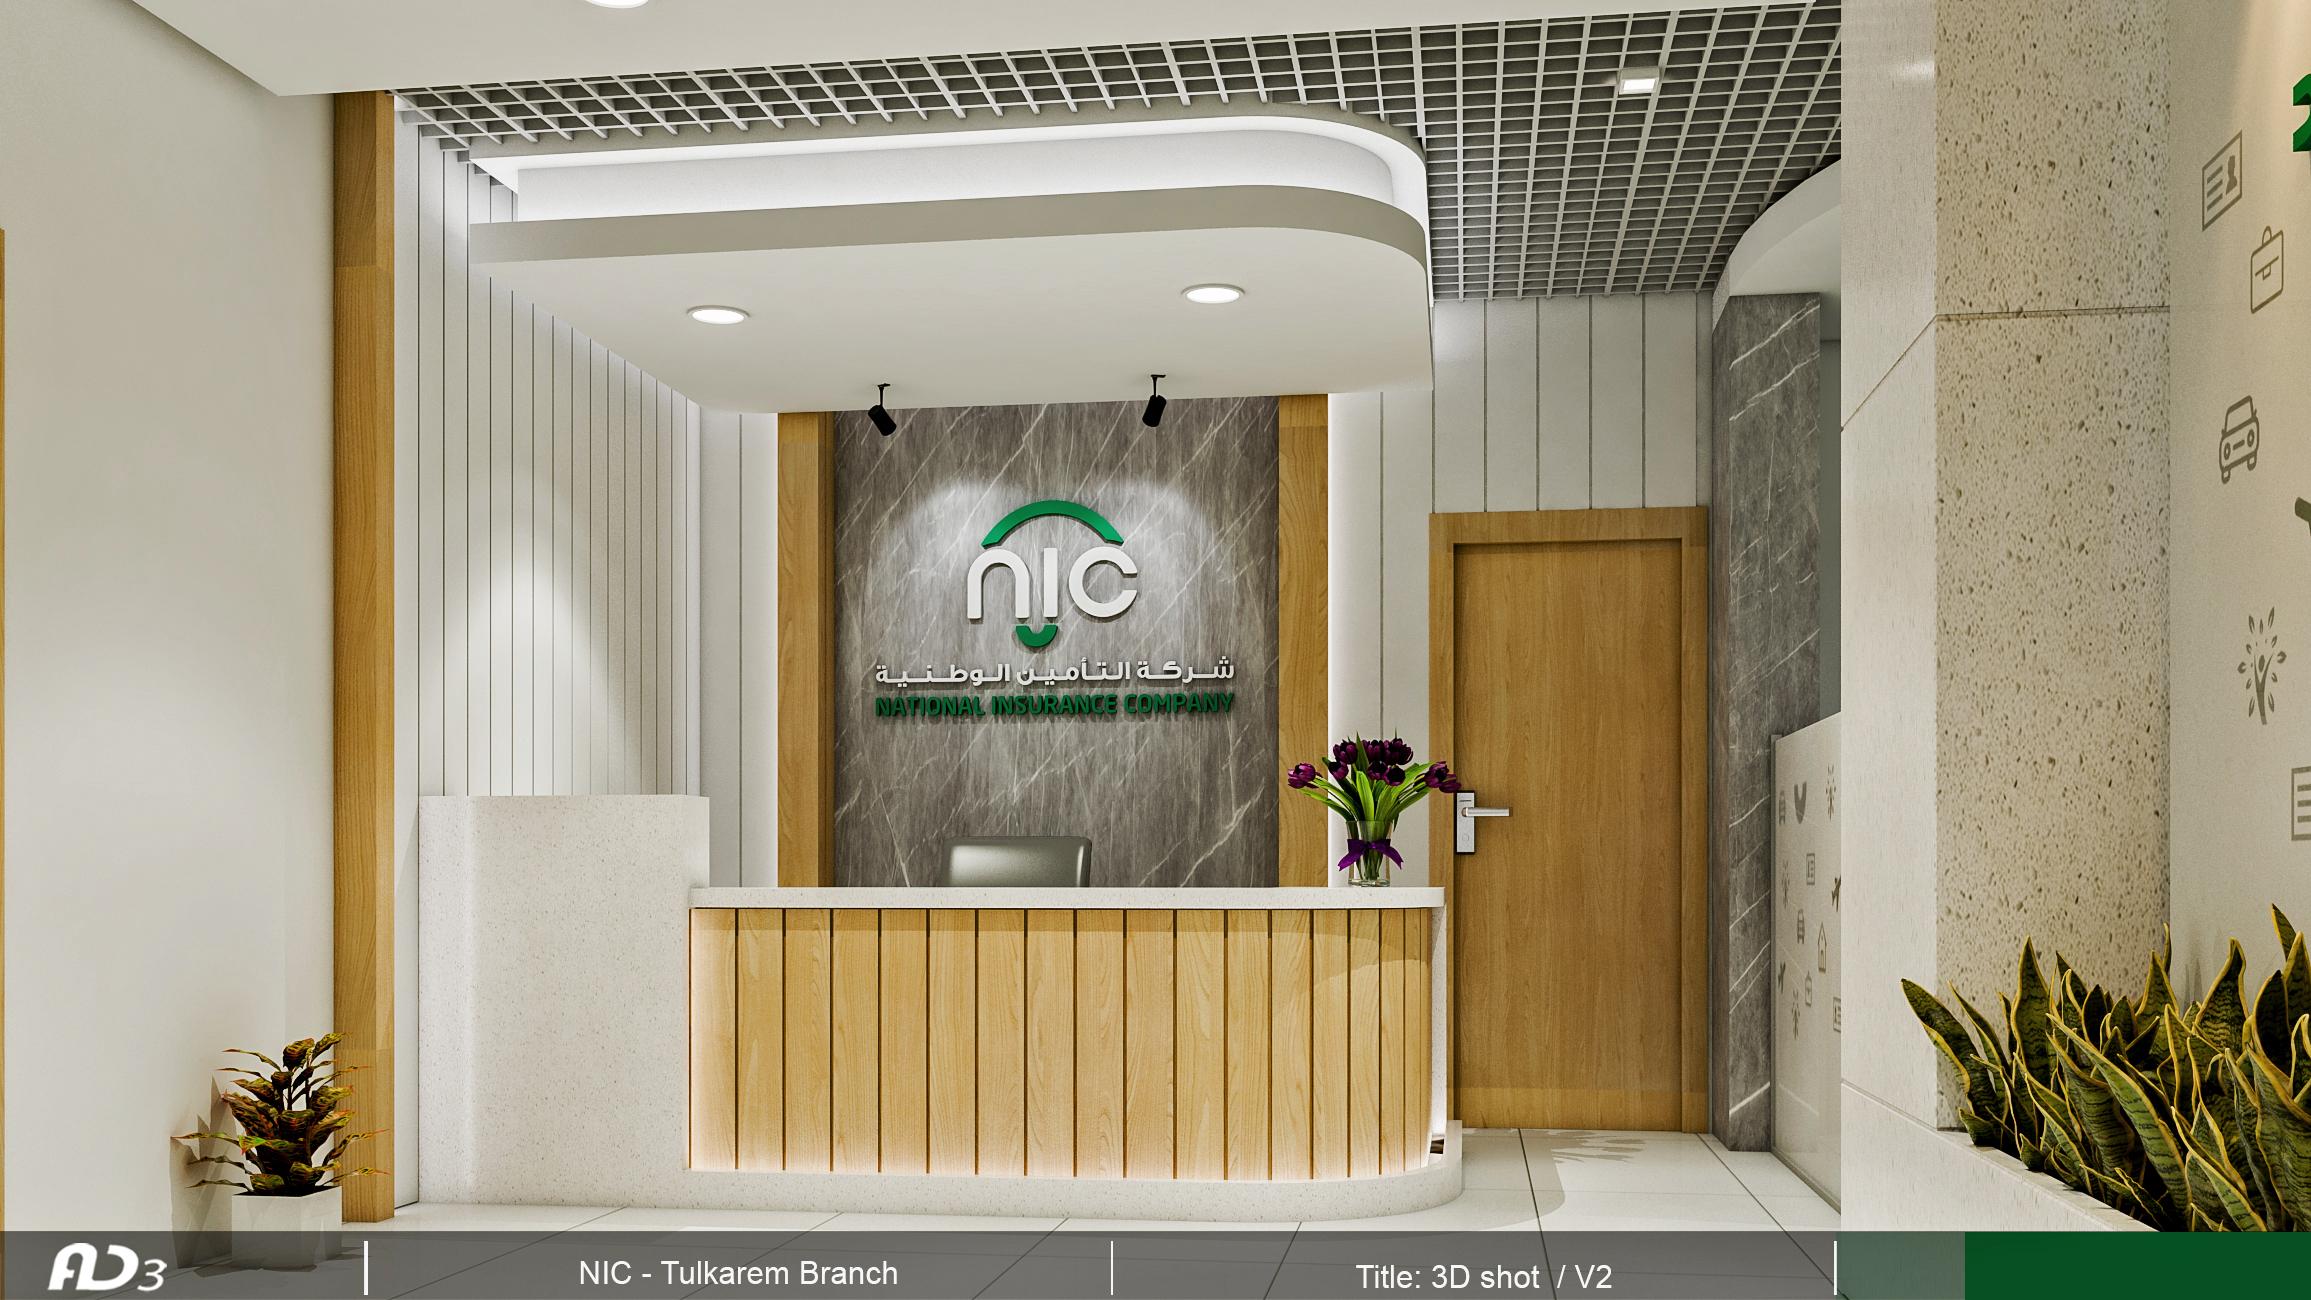 National insurance company - Tulkarm Branch